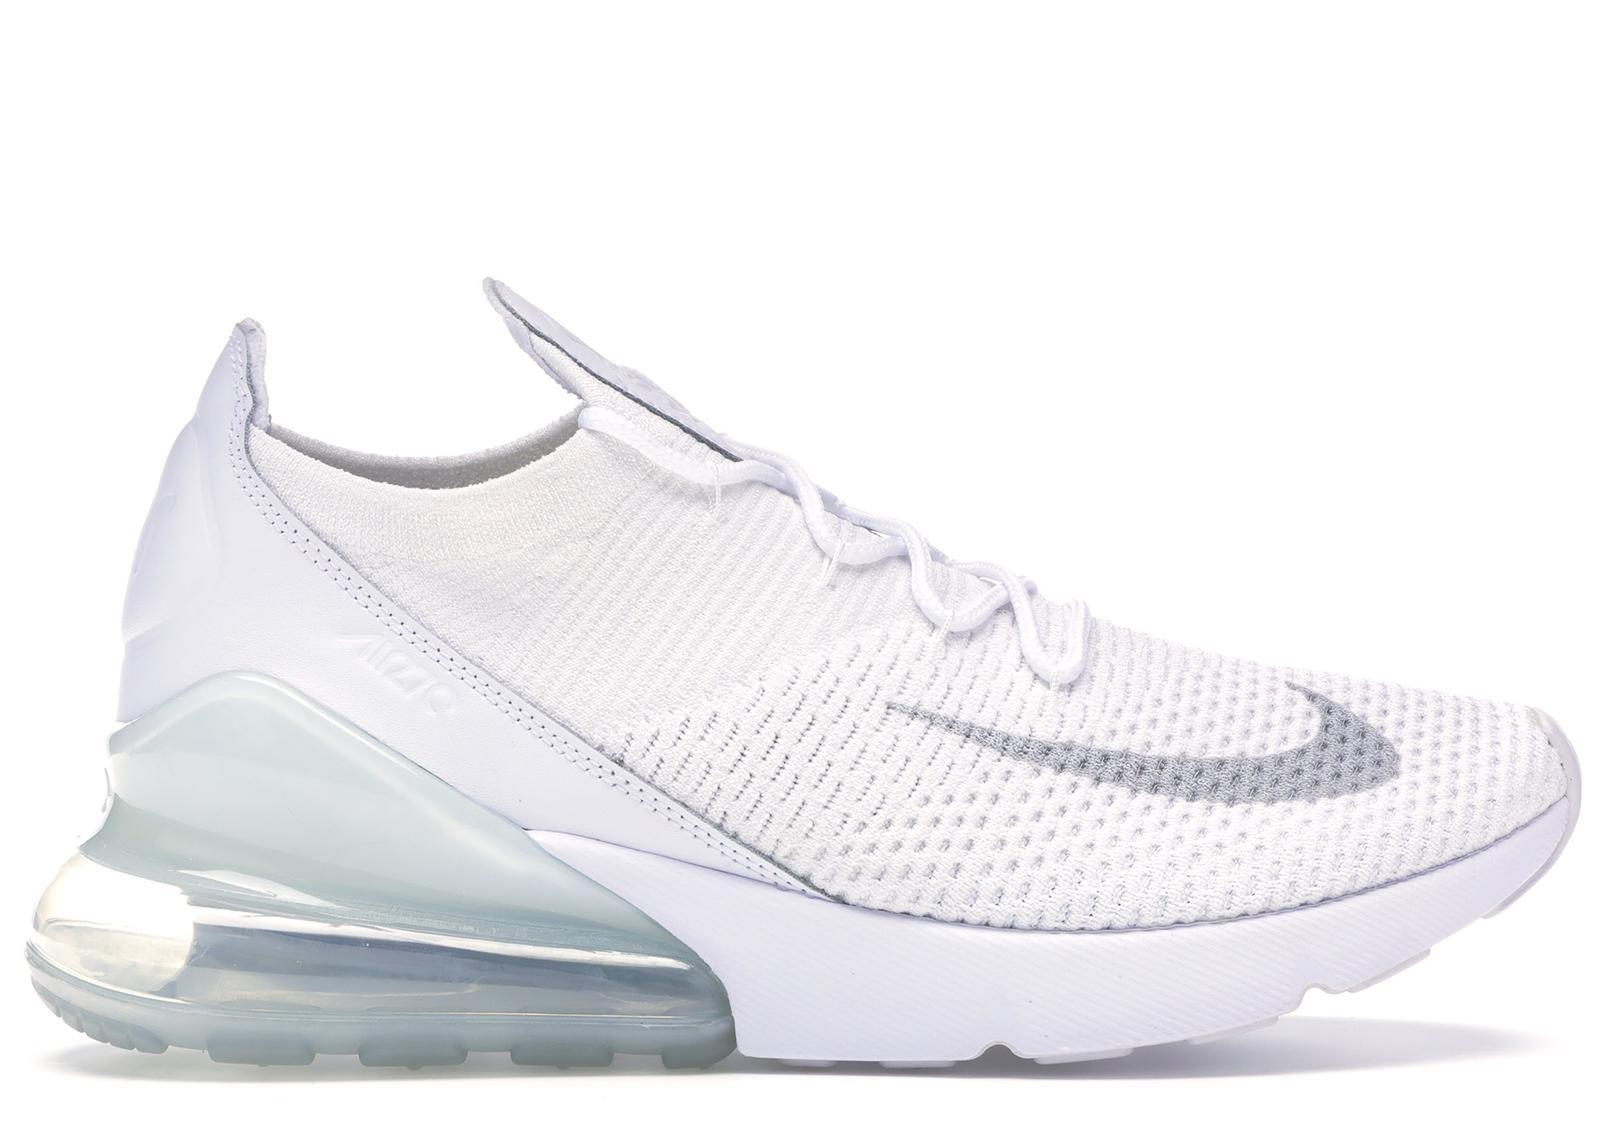 Nike Air Max 270 Flyknit Triple White